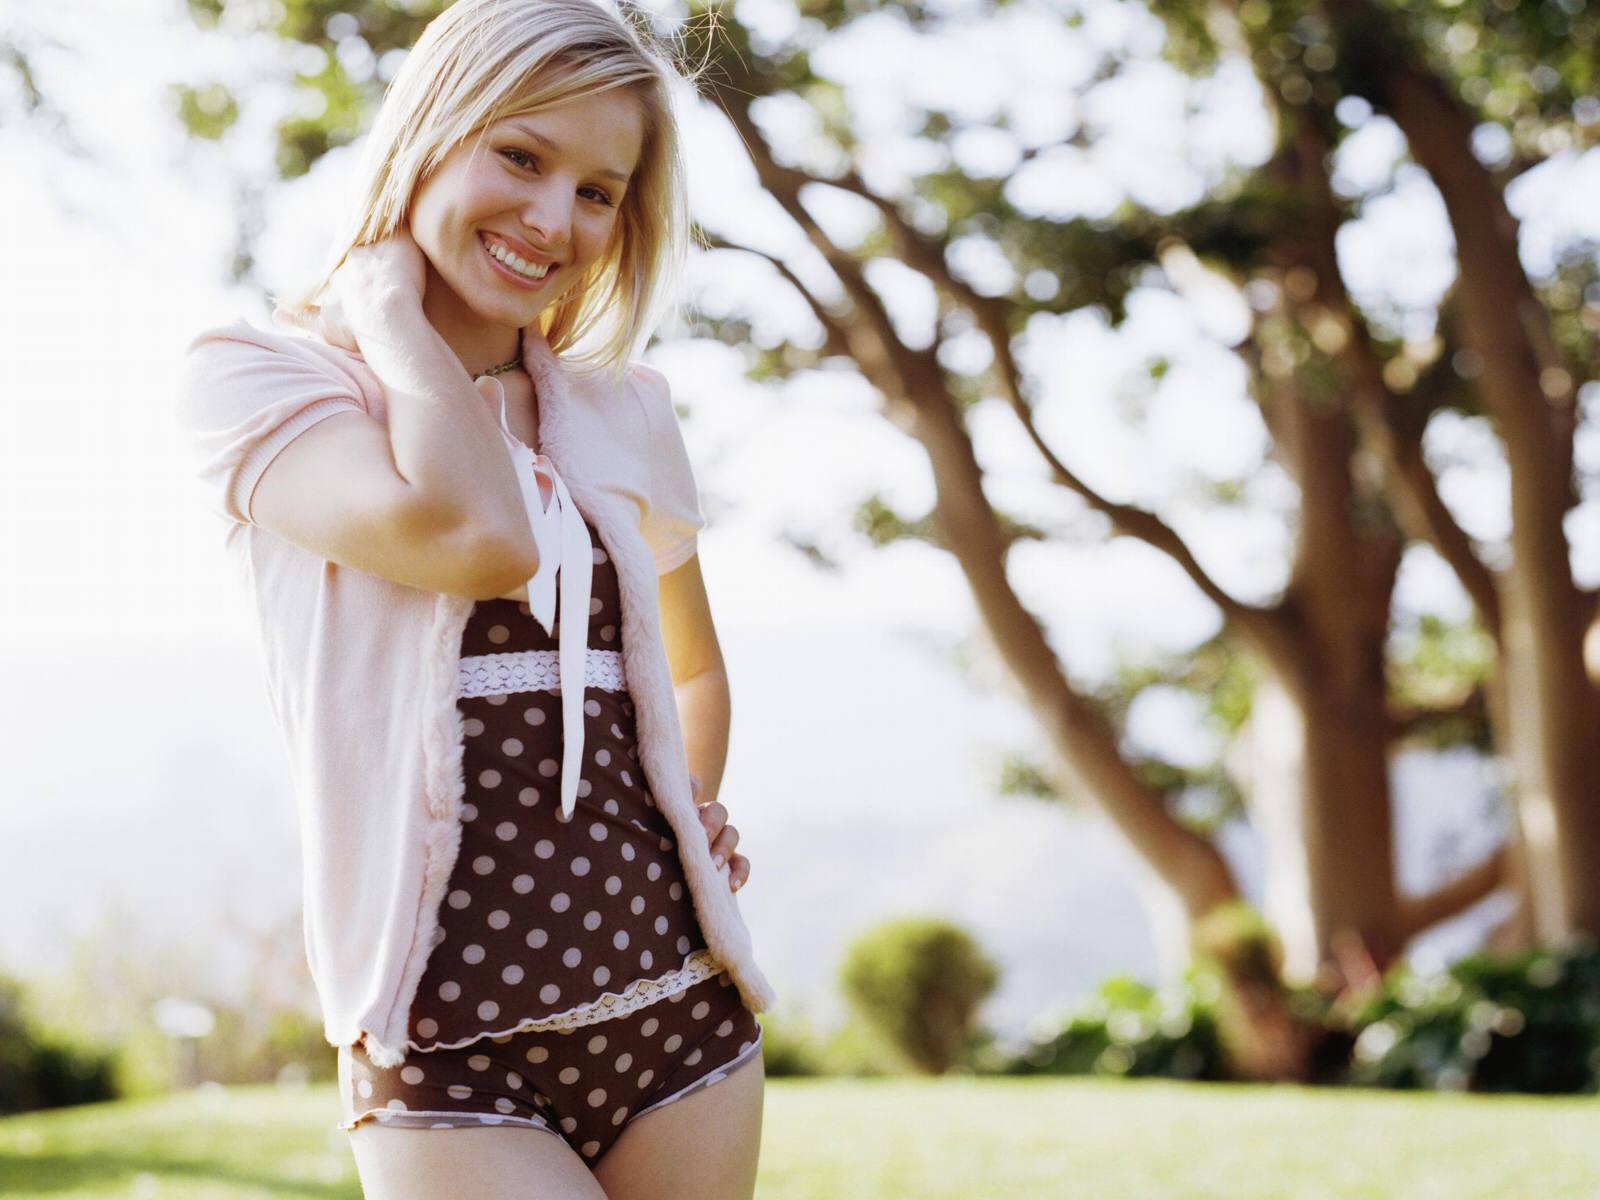 Kristen Bell Free